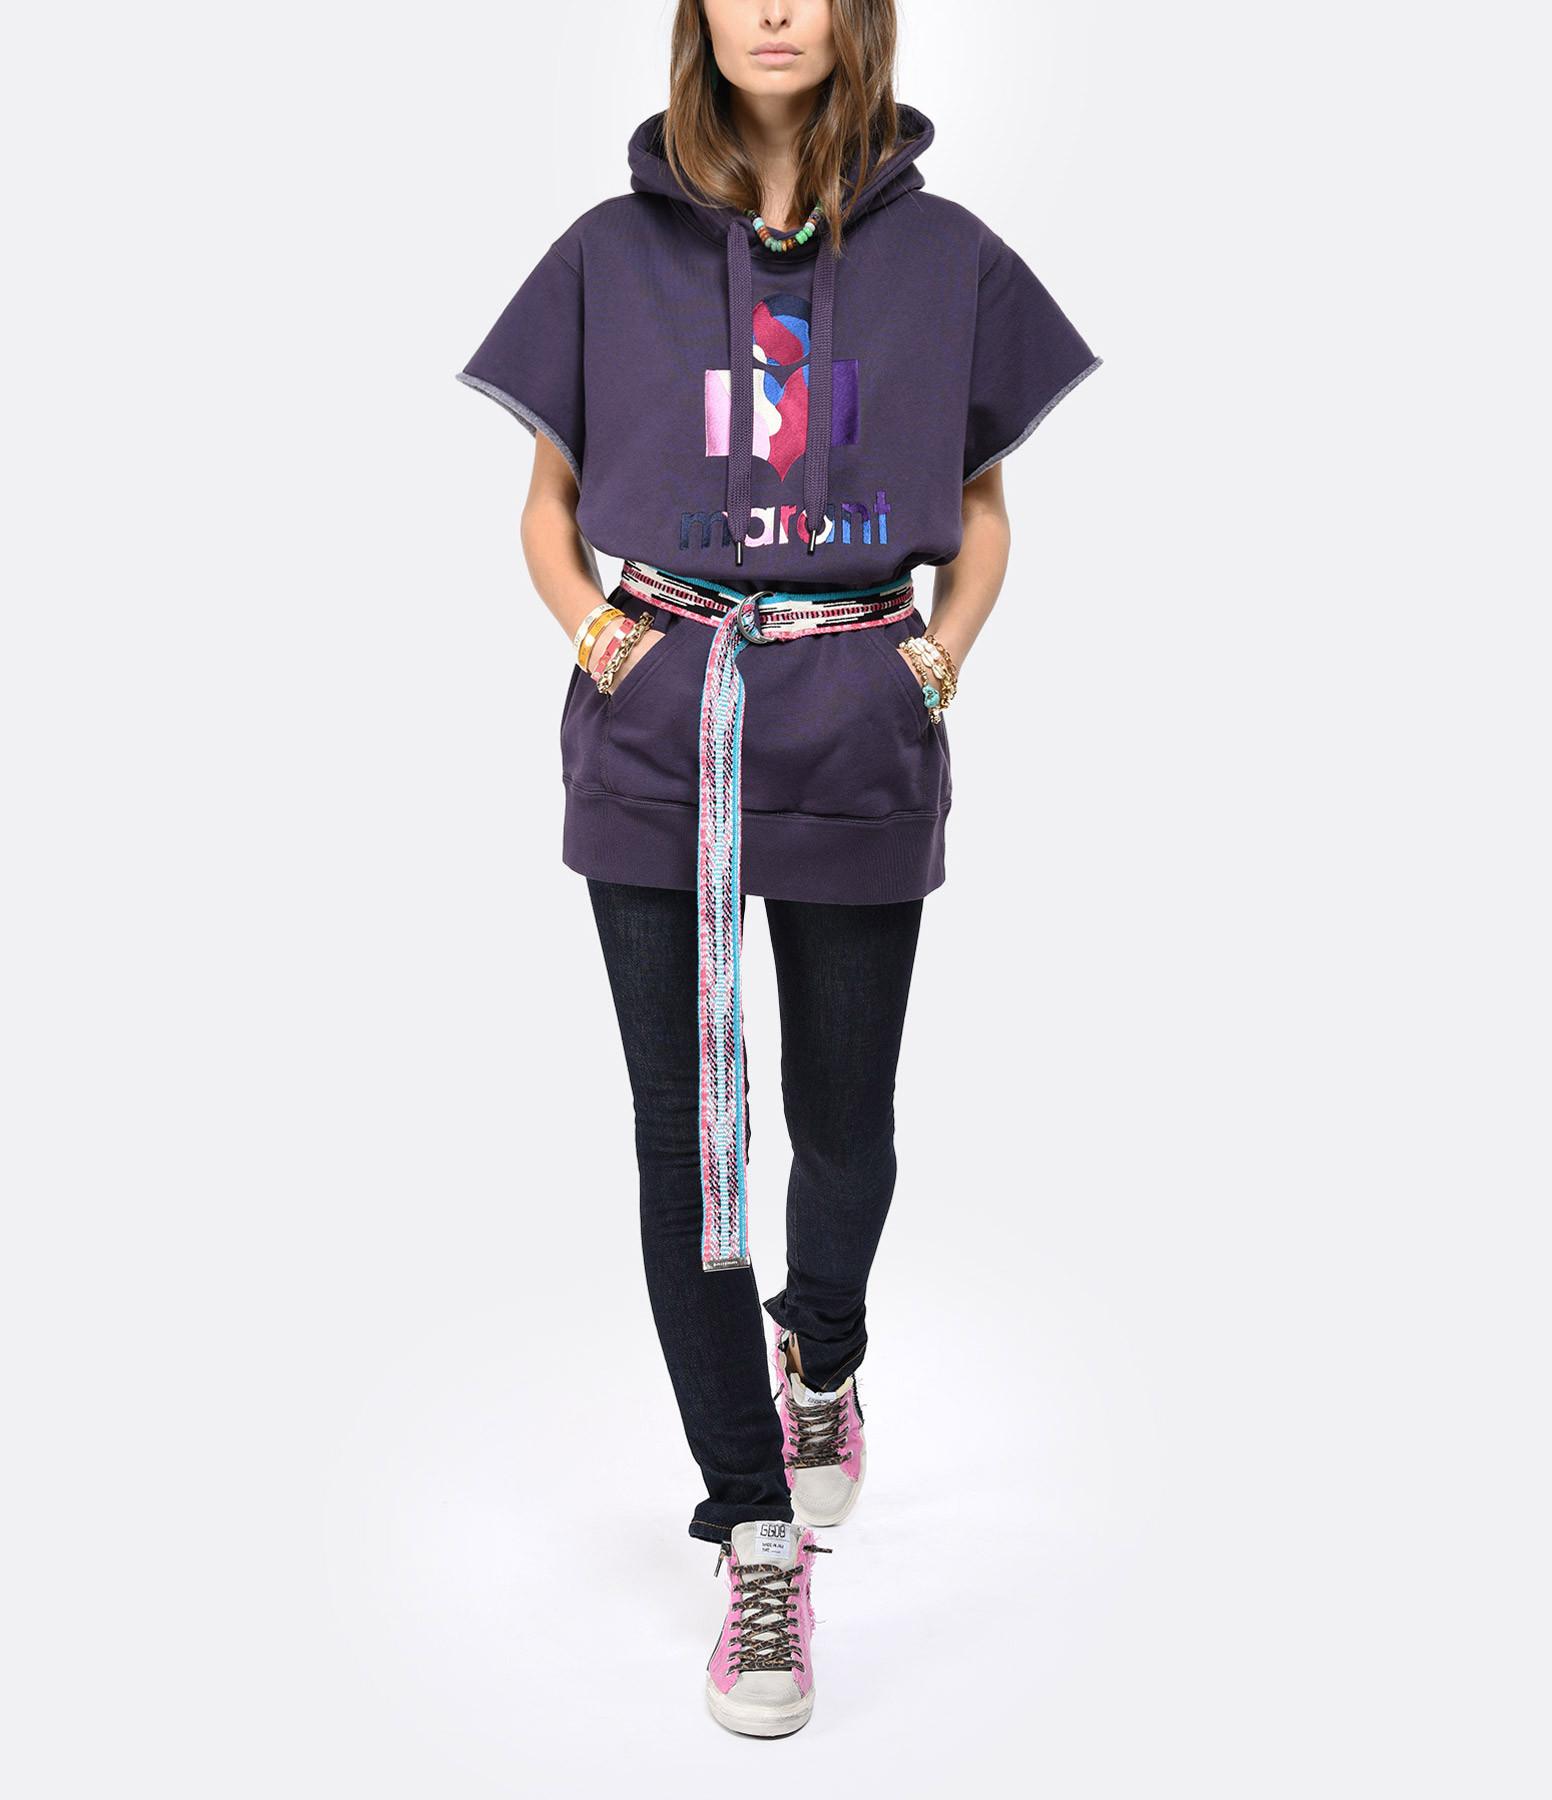 ISABEL MARANT ÉTOILE - Sweatshirt Milesy Coton Bleu Nuit